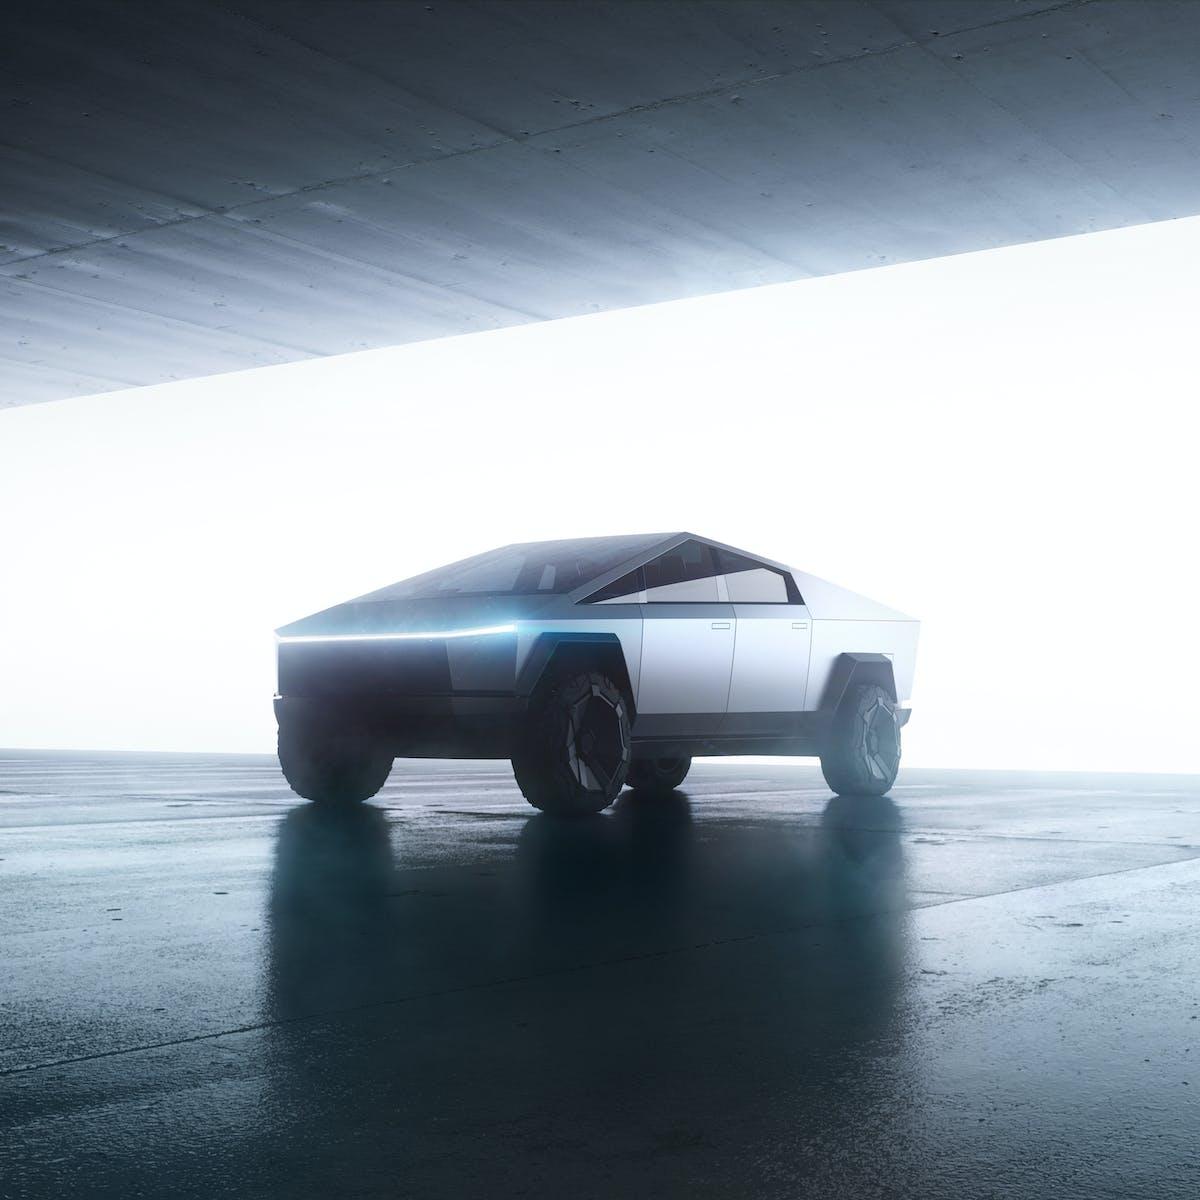 Tesla Cybertruck: Elon Musk sets 'insane' target for design's efficiency